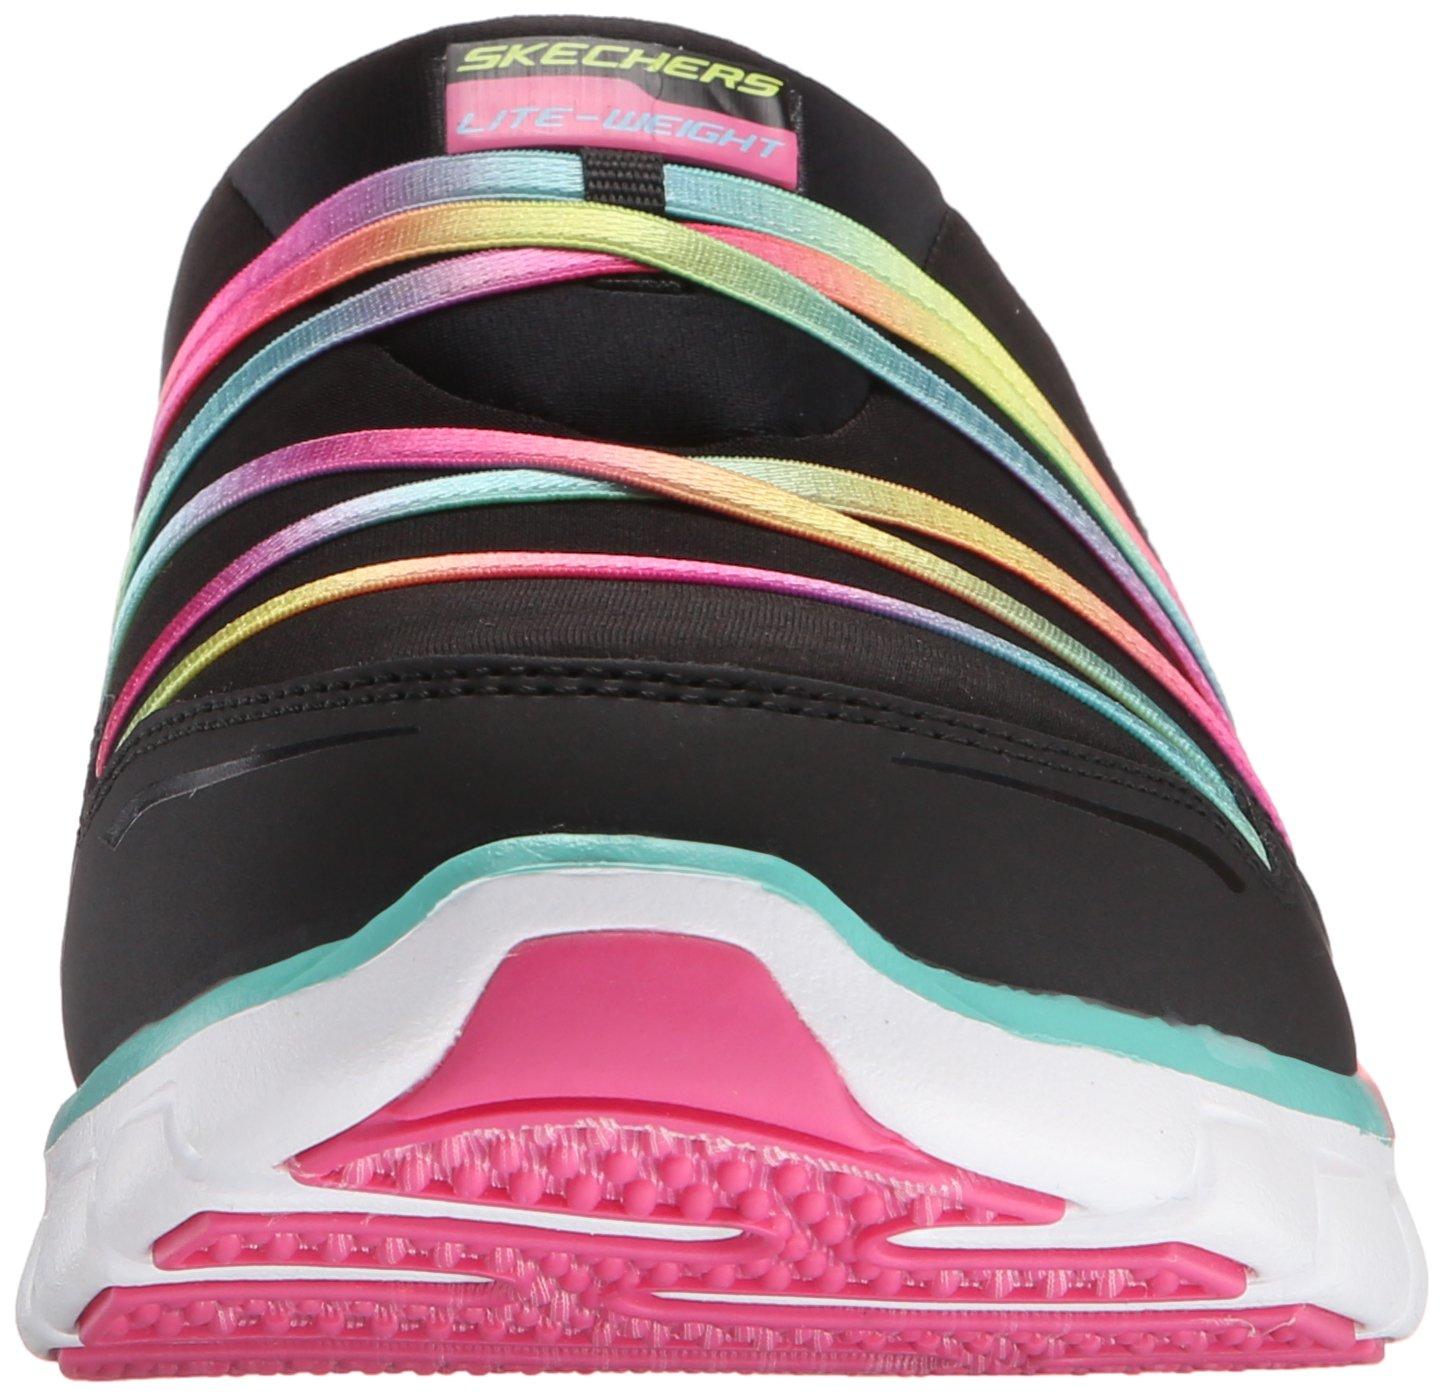 Skechers Sport Women's Air Streamer Slip-On Mule